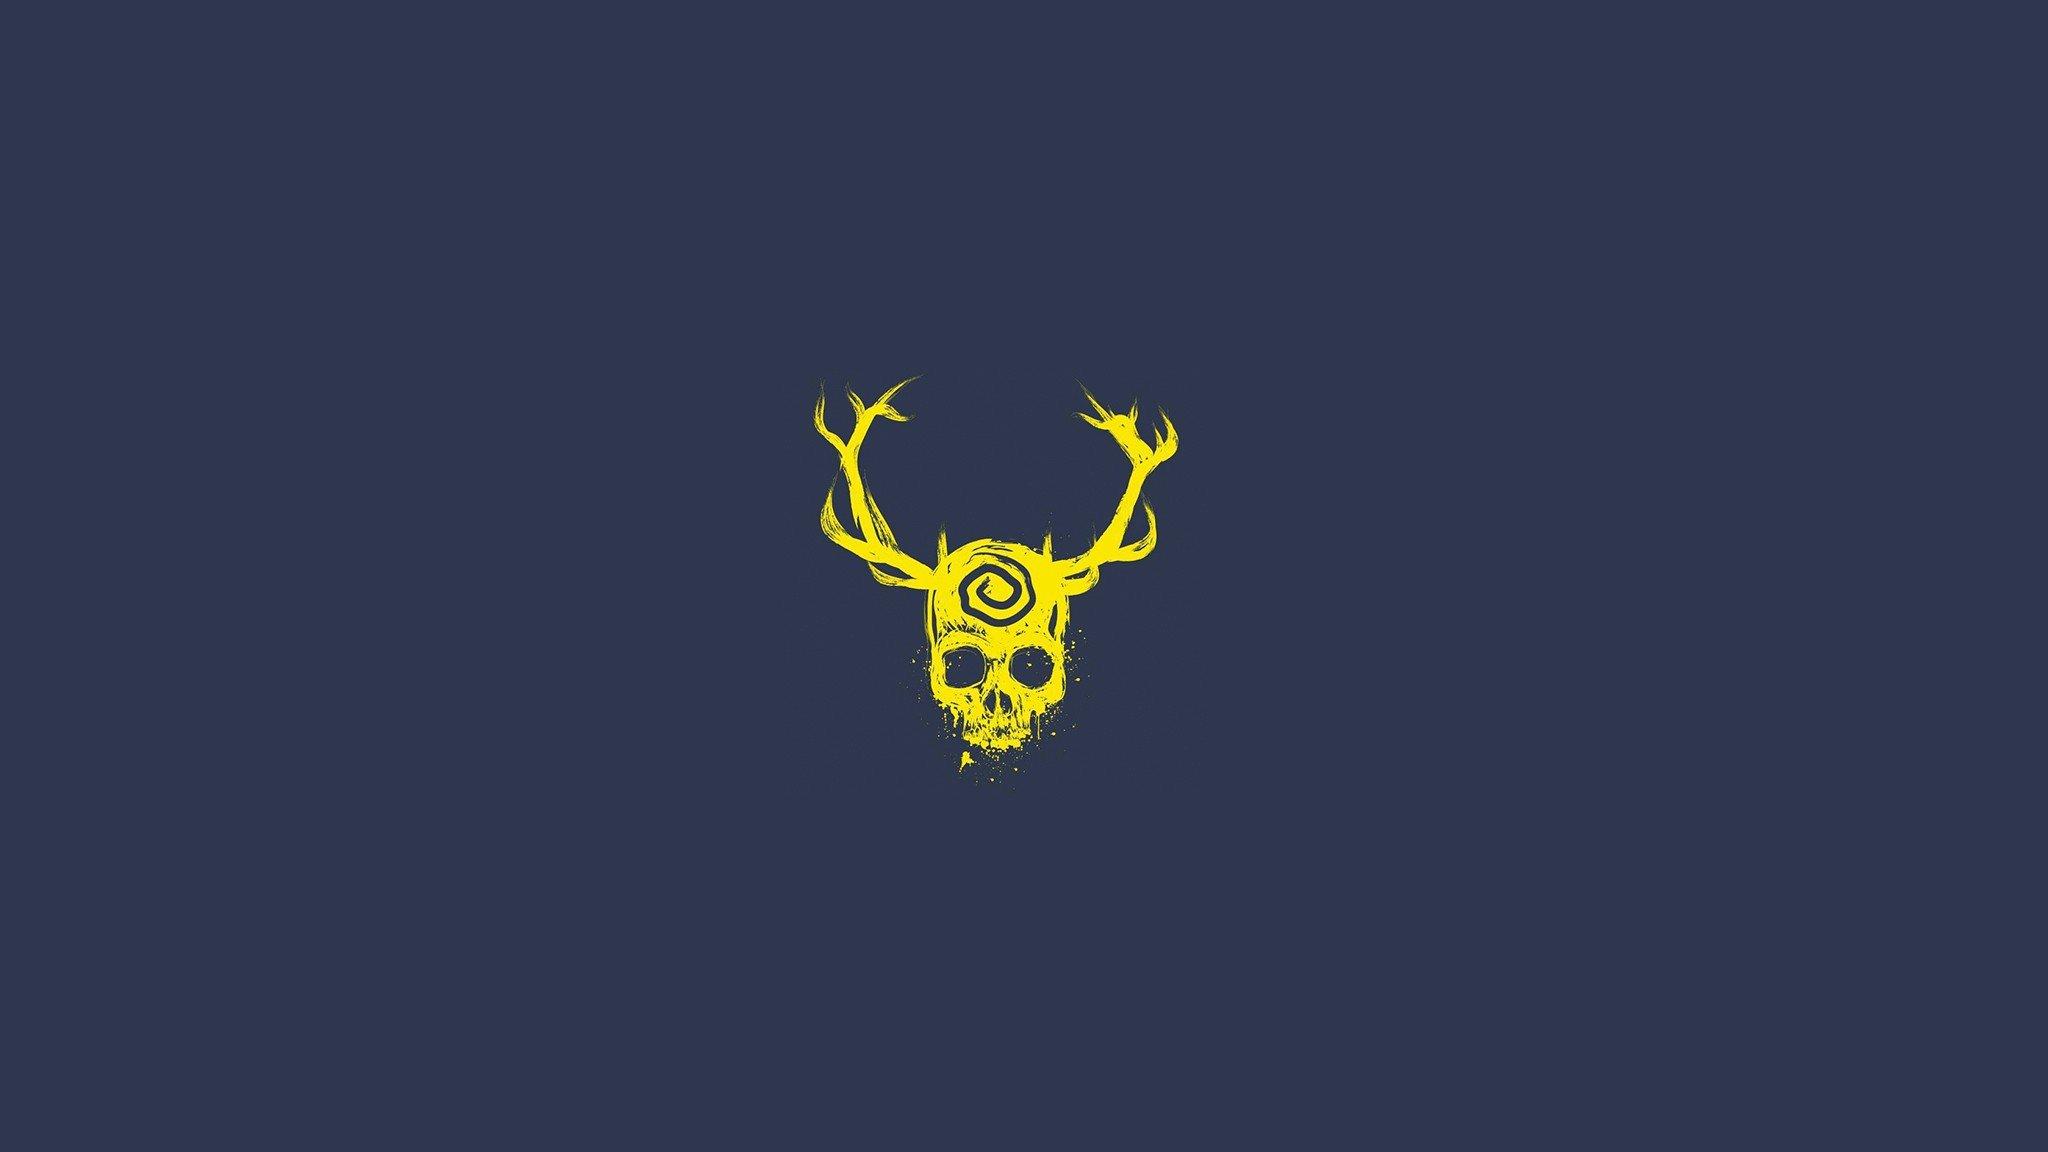 Skyrim Iphone X Wallpaper Skull Yellow Dark Blue True Detective Wallpapers Hd